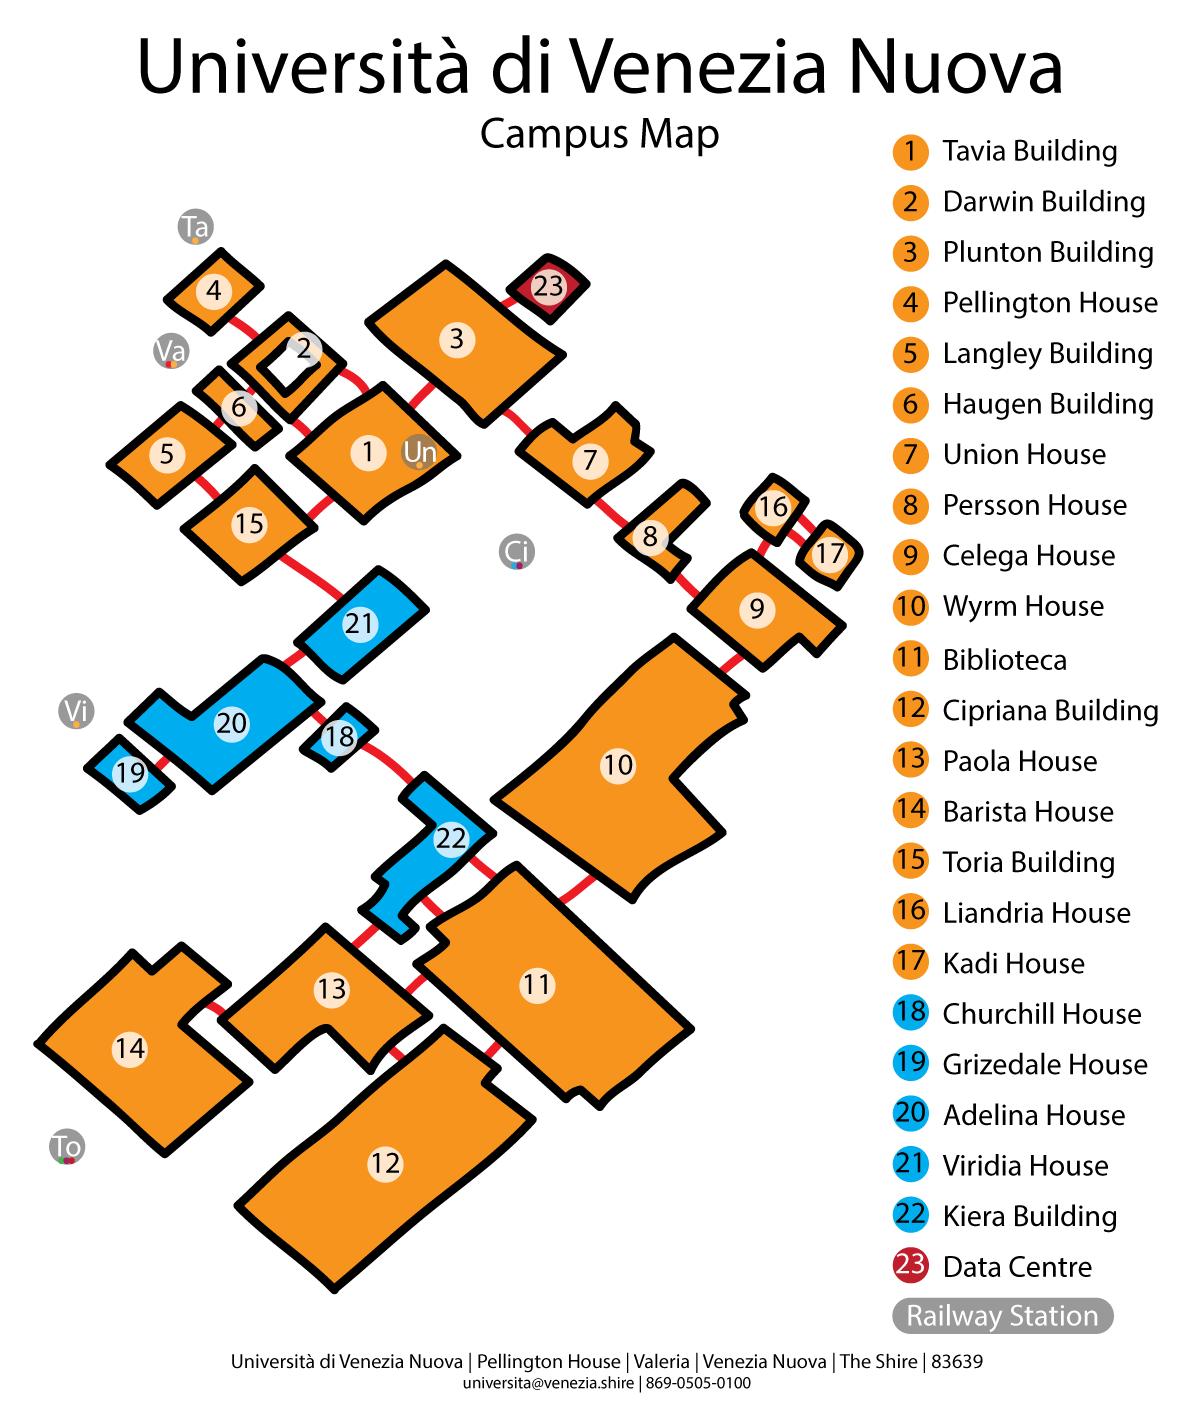 Universita-di-venezia-nuova-campus-map.png